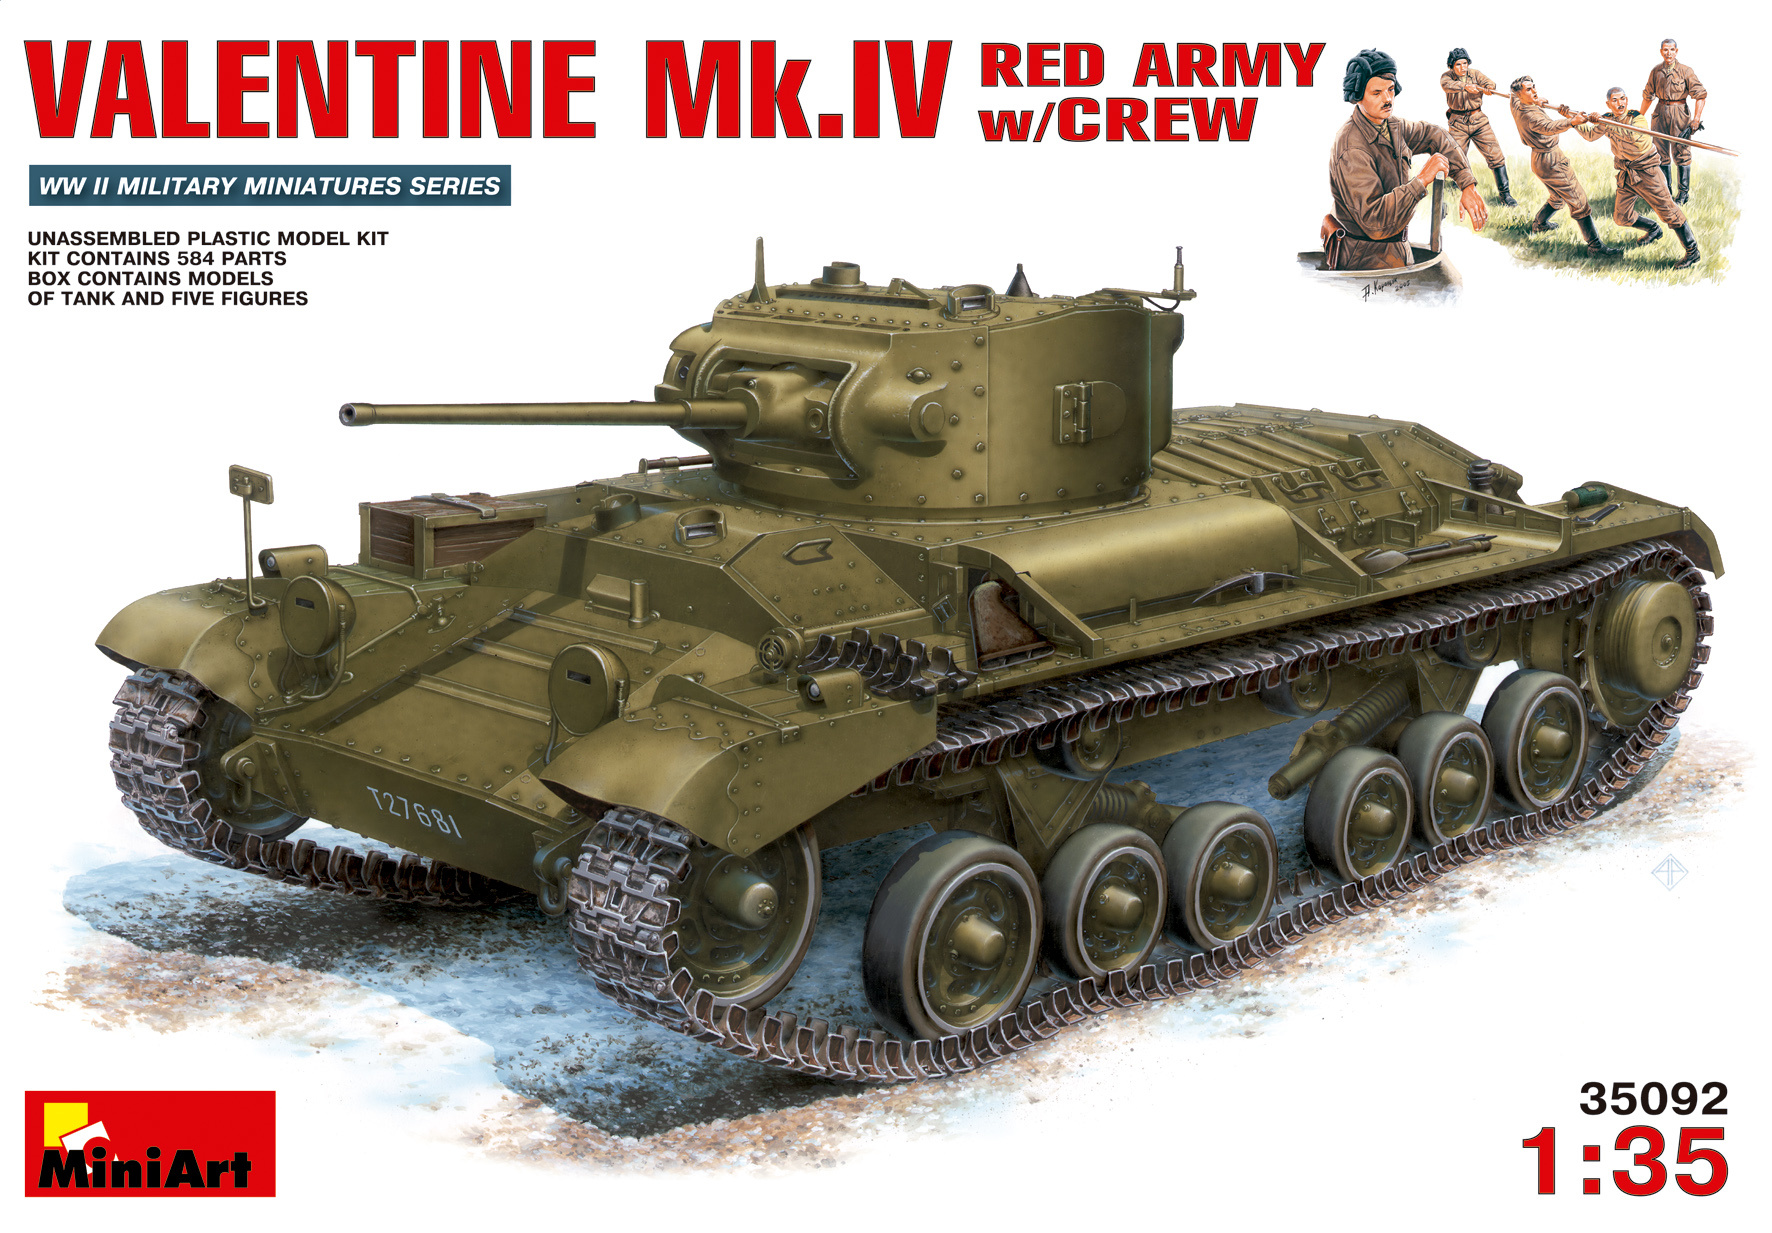 MiniArt Valentine Mk.4 Red Army With Crew - Scale 1/35 - Mini Art - MIT35092